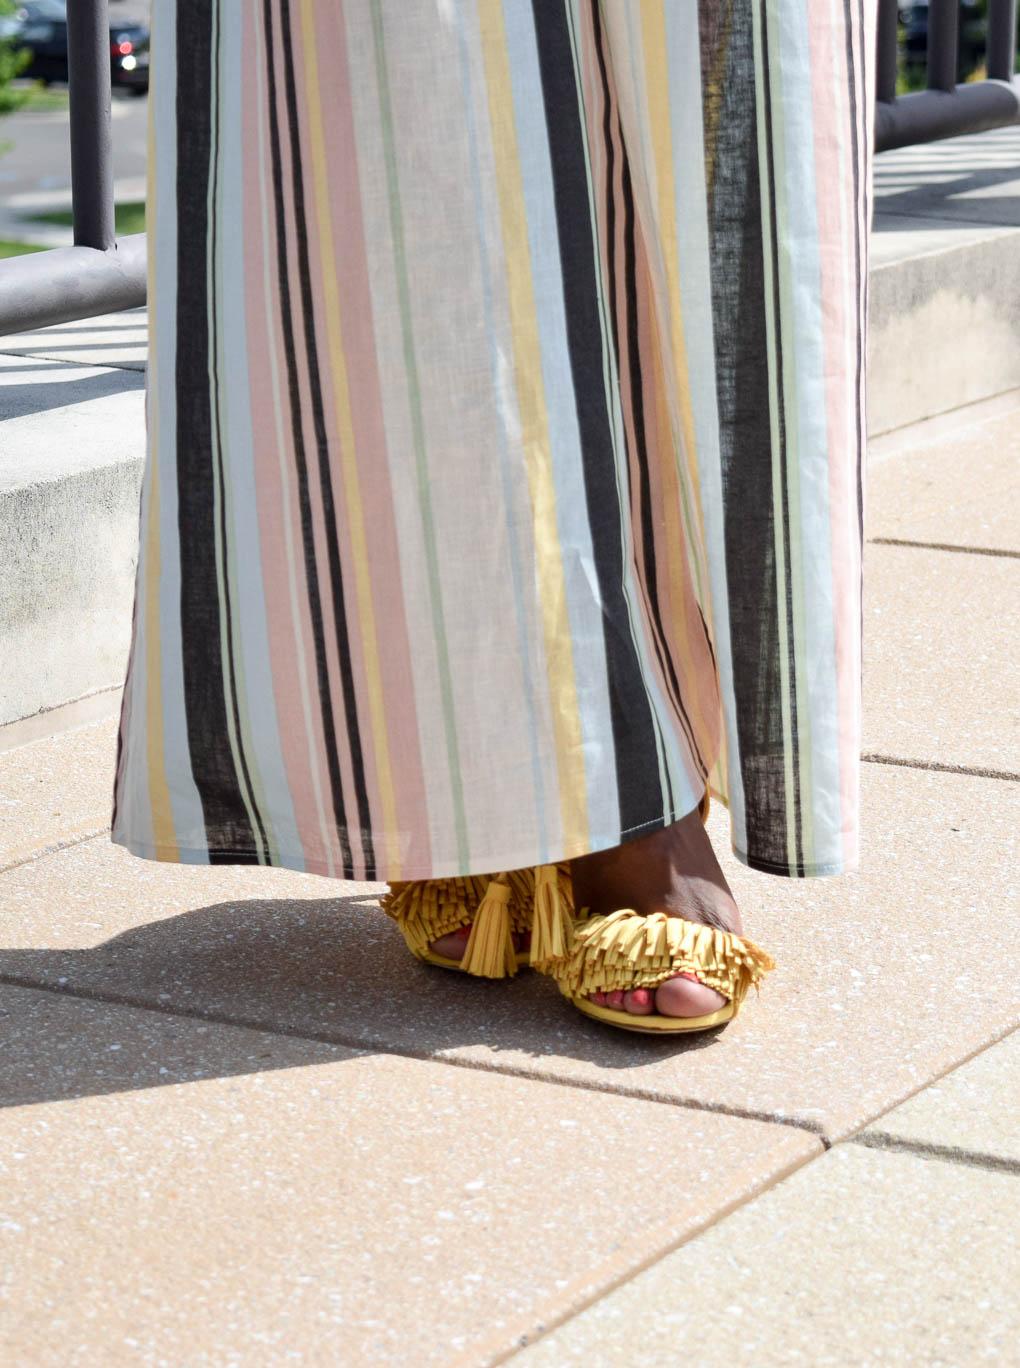 Style-files-target-Women Palazzo-Pant- Striped-  Xhilaration-Xhilaration-striped-wideleg-linen-pants-forever21-crop-racerback-tank-yellow-tayrey-fringe-heels-justfab-yellow-fringe-heels-how-oohlalablog-7